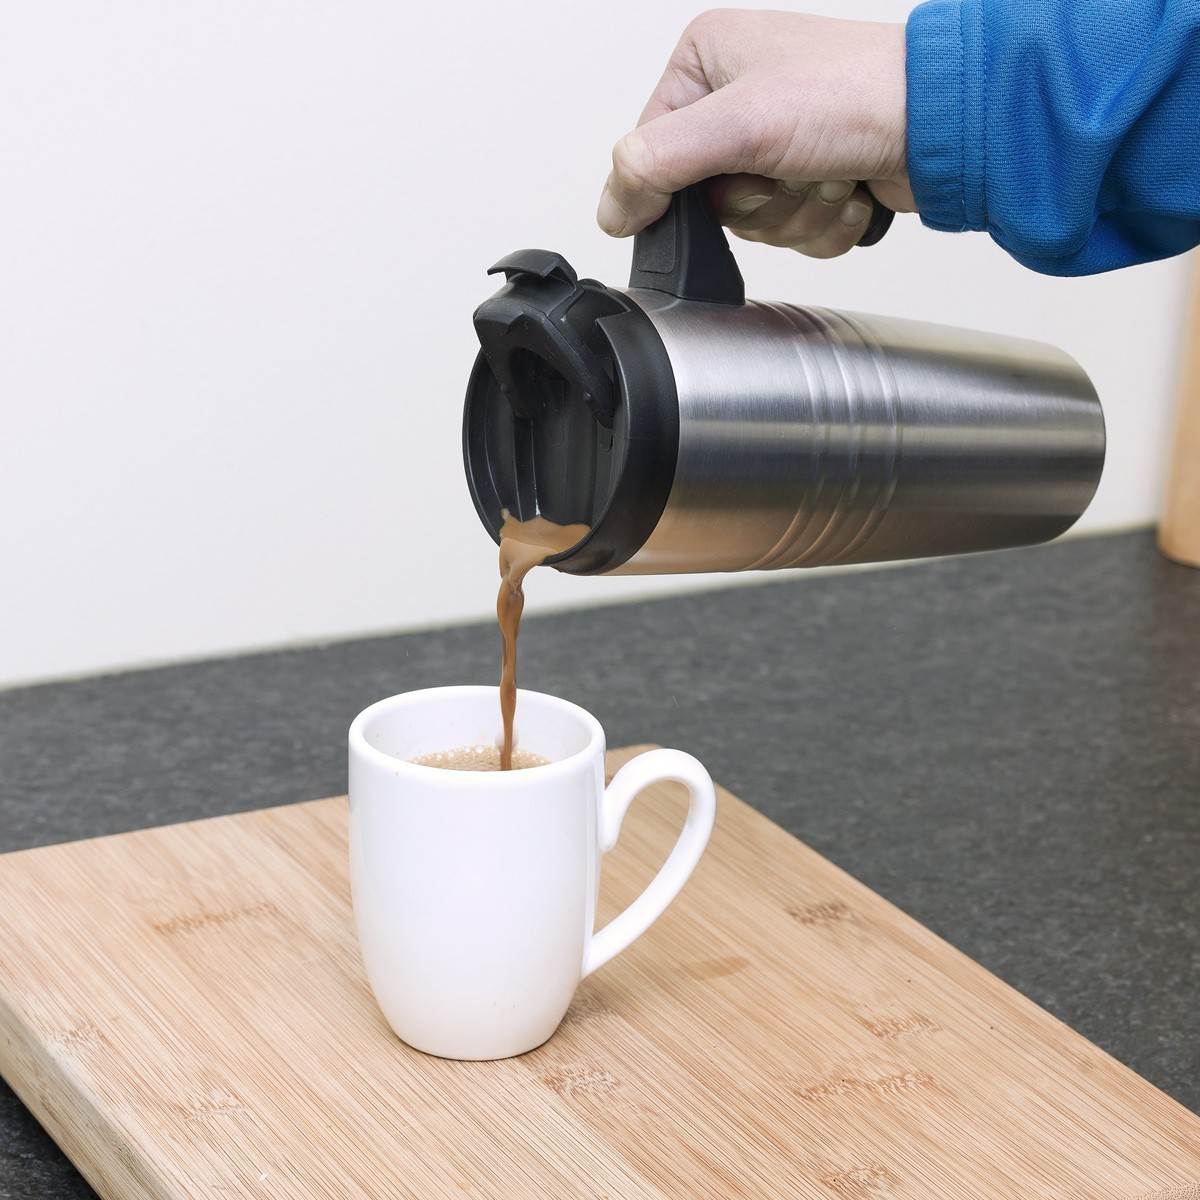 Cafetera termo con temporizador acup650 bestron - Cafetera con molinillo incorporado ...